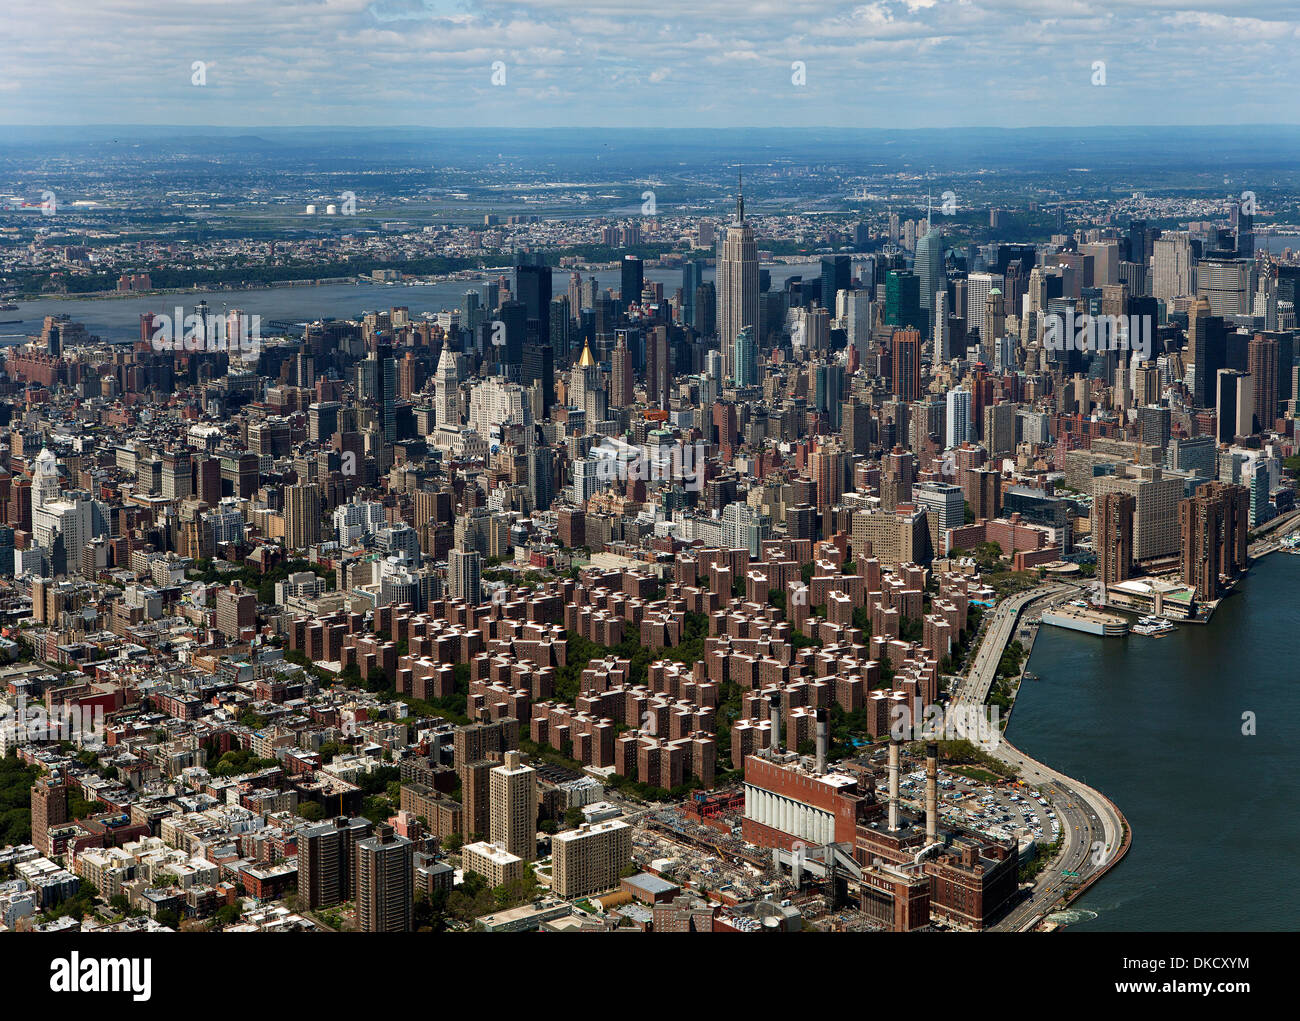 aerial photograph Stuyvesant Town Peter Cooper Village to midtown Manhattan, New York City - Stock Image